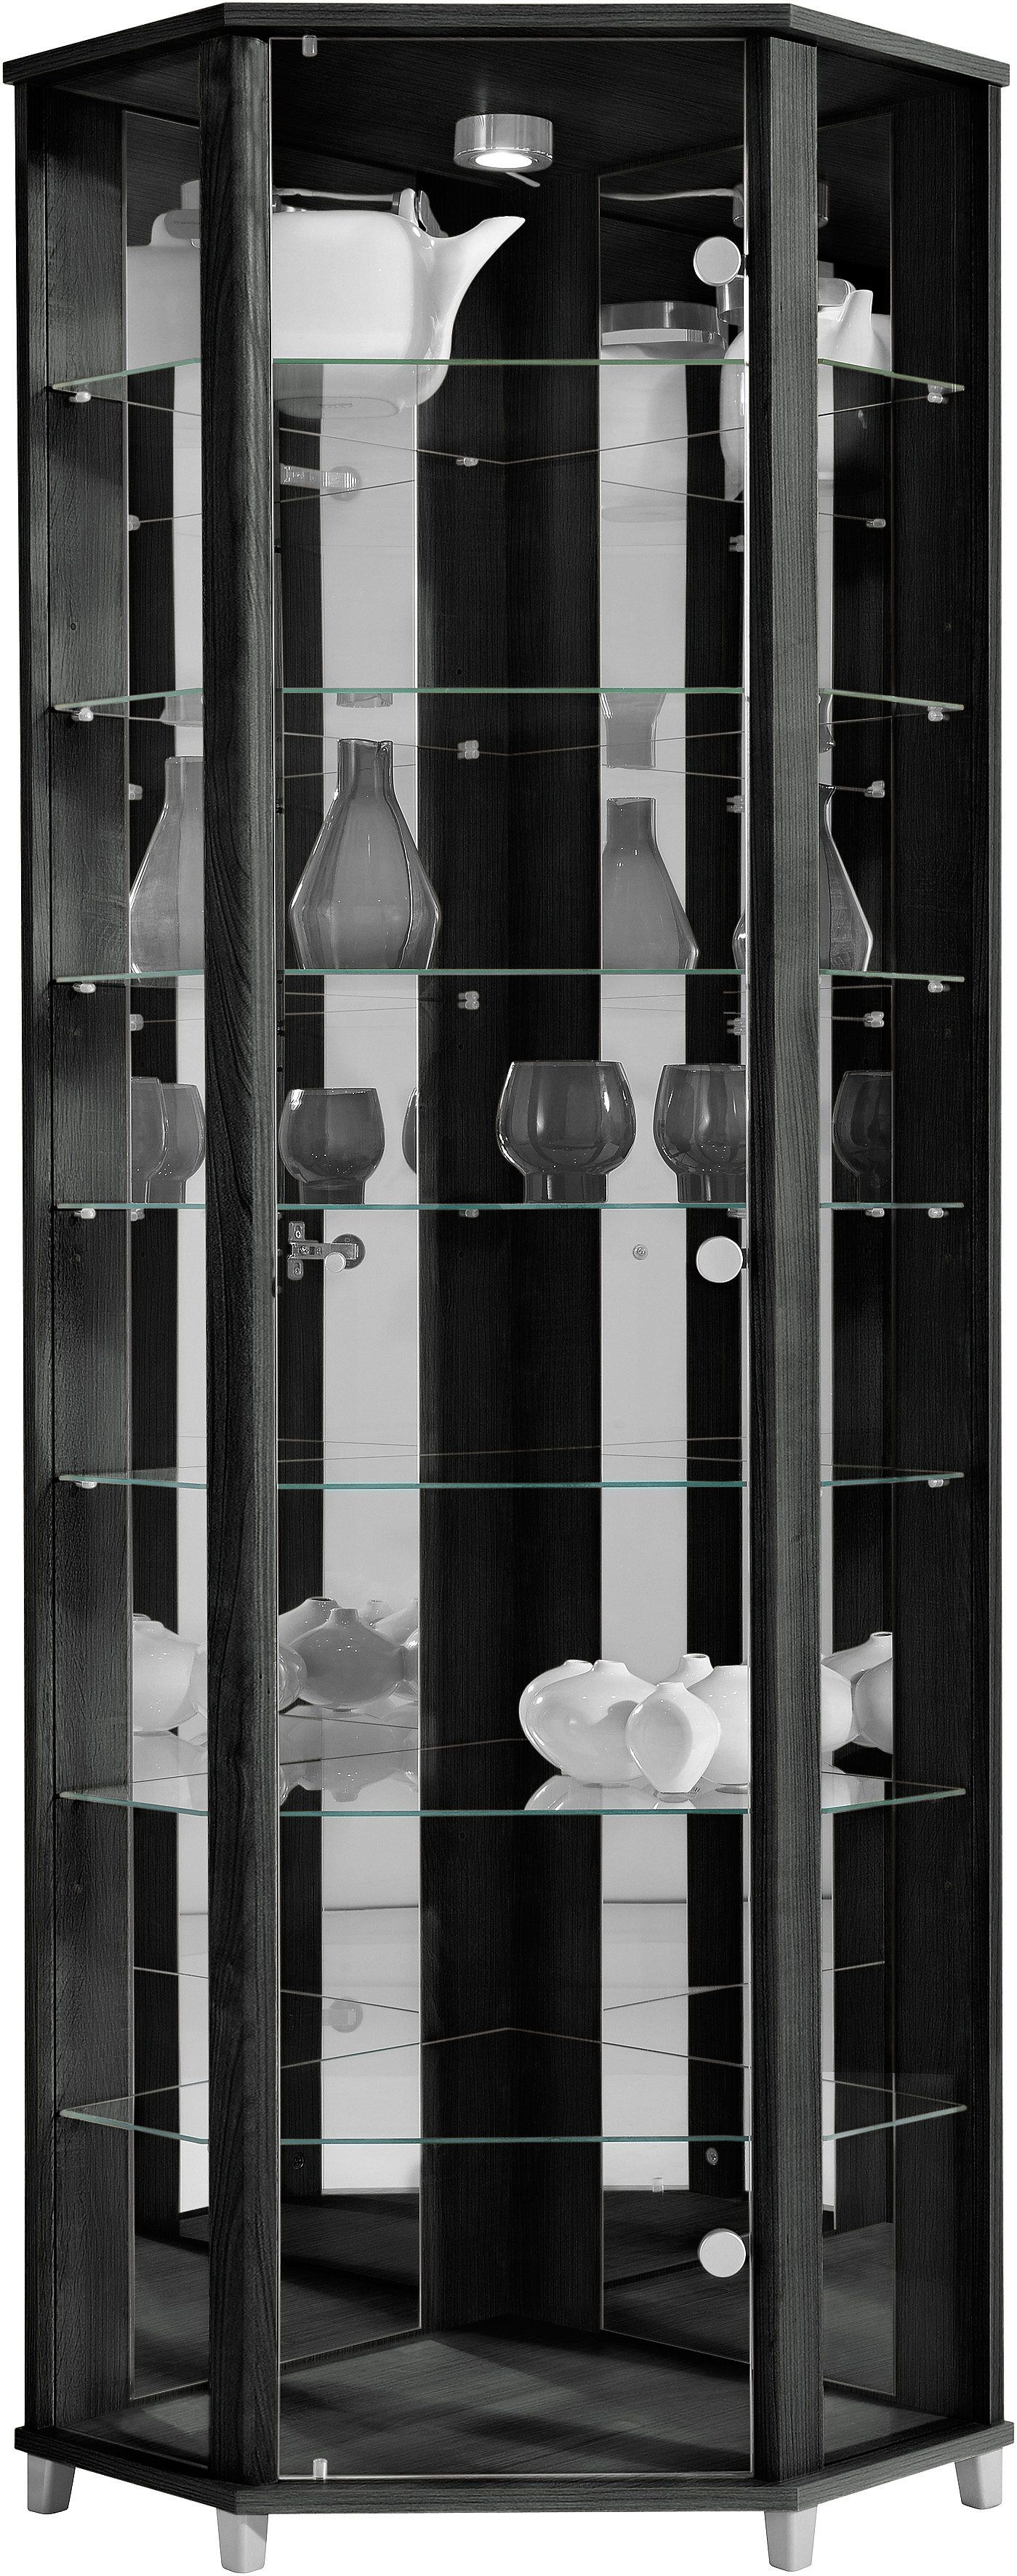 Eckvitrine Höhe 172 cm 7 Glasböden   Wohnzimmer > Vitrinen > Eckvitrinen   Schwarz